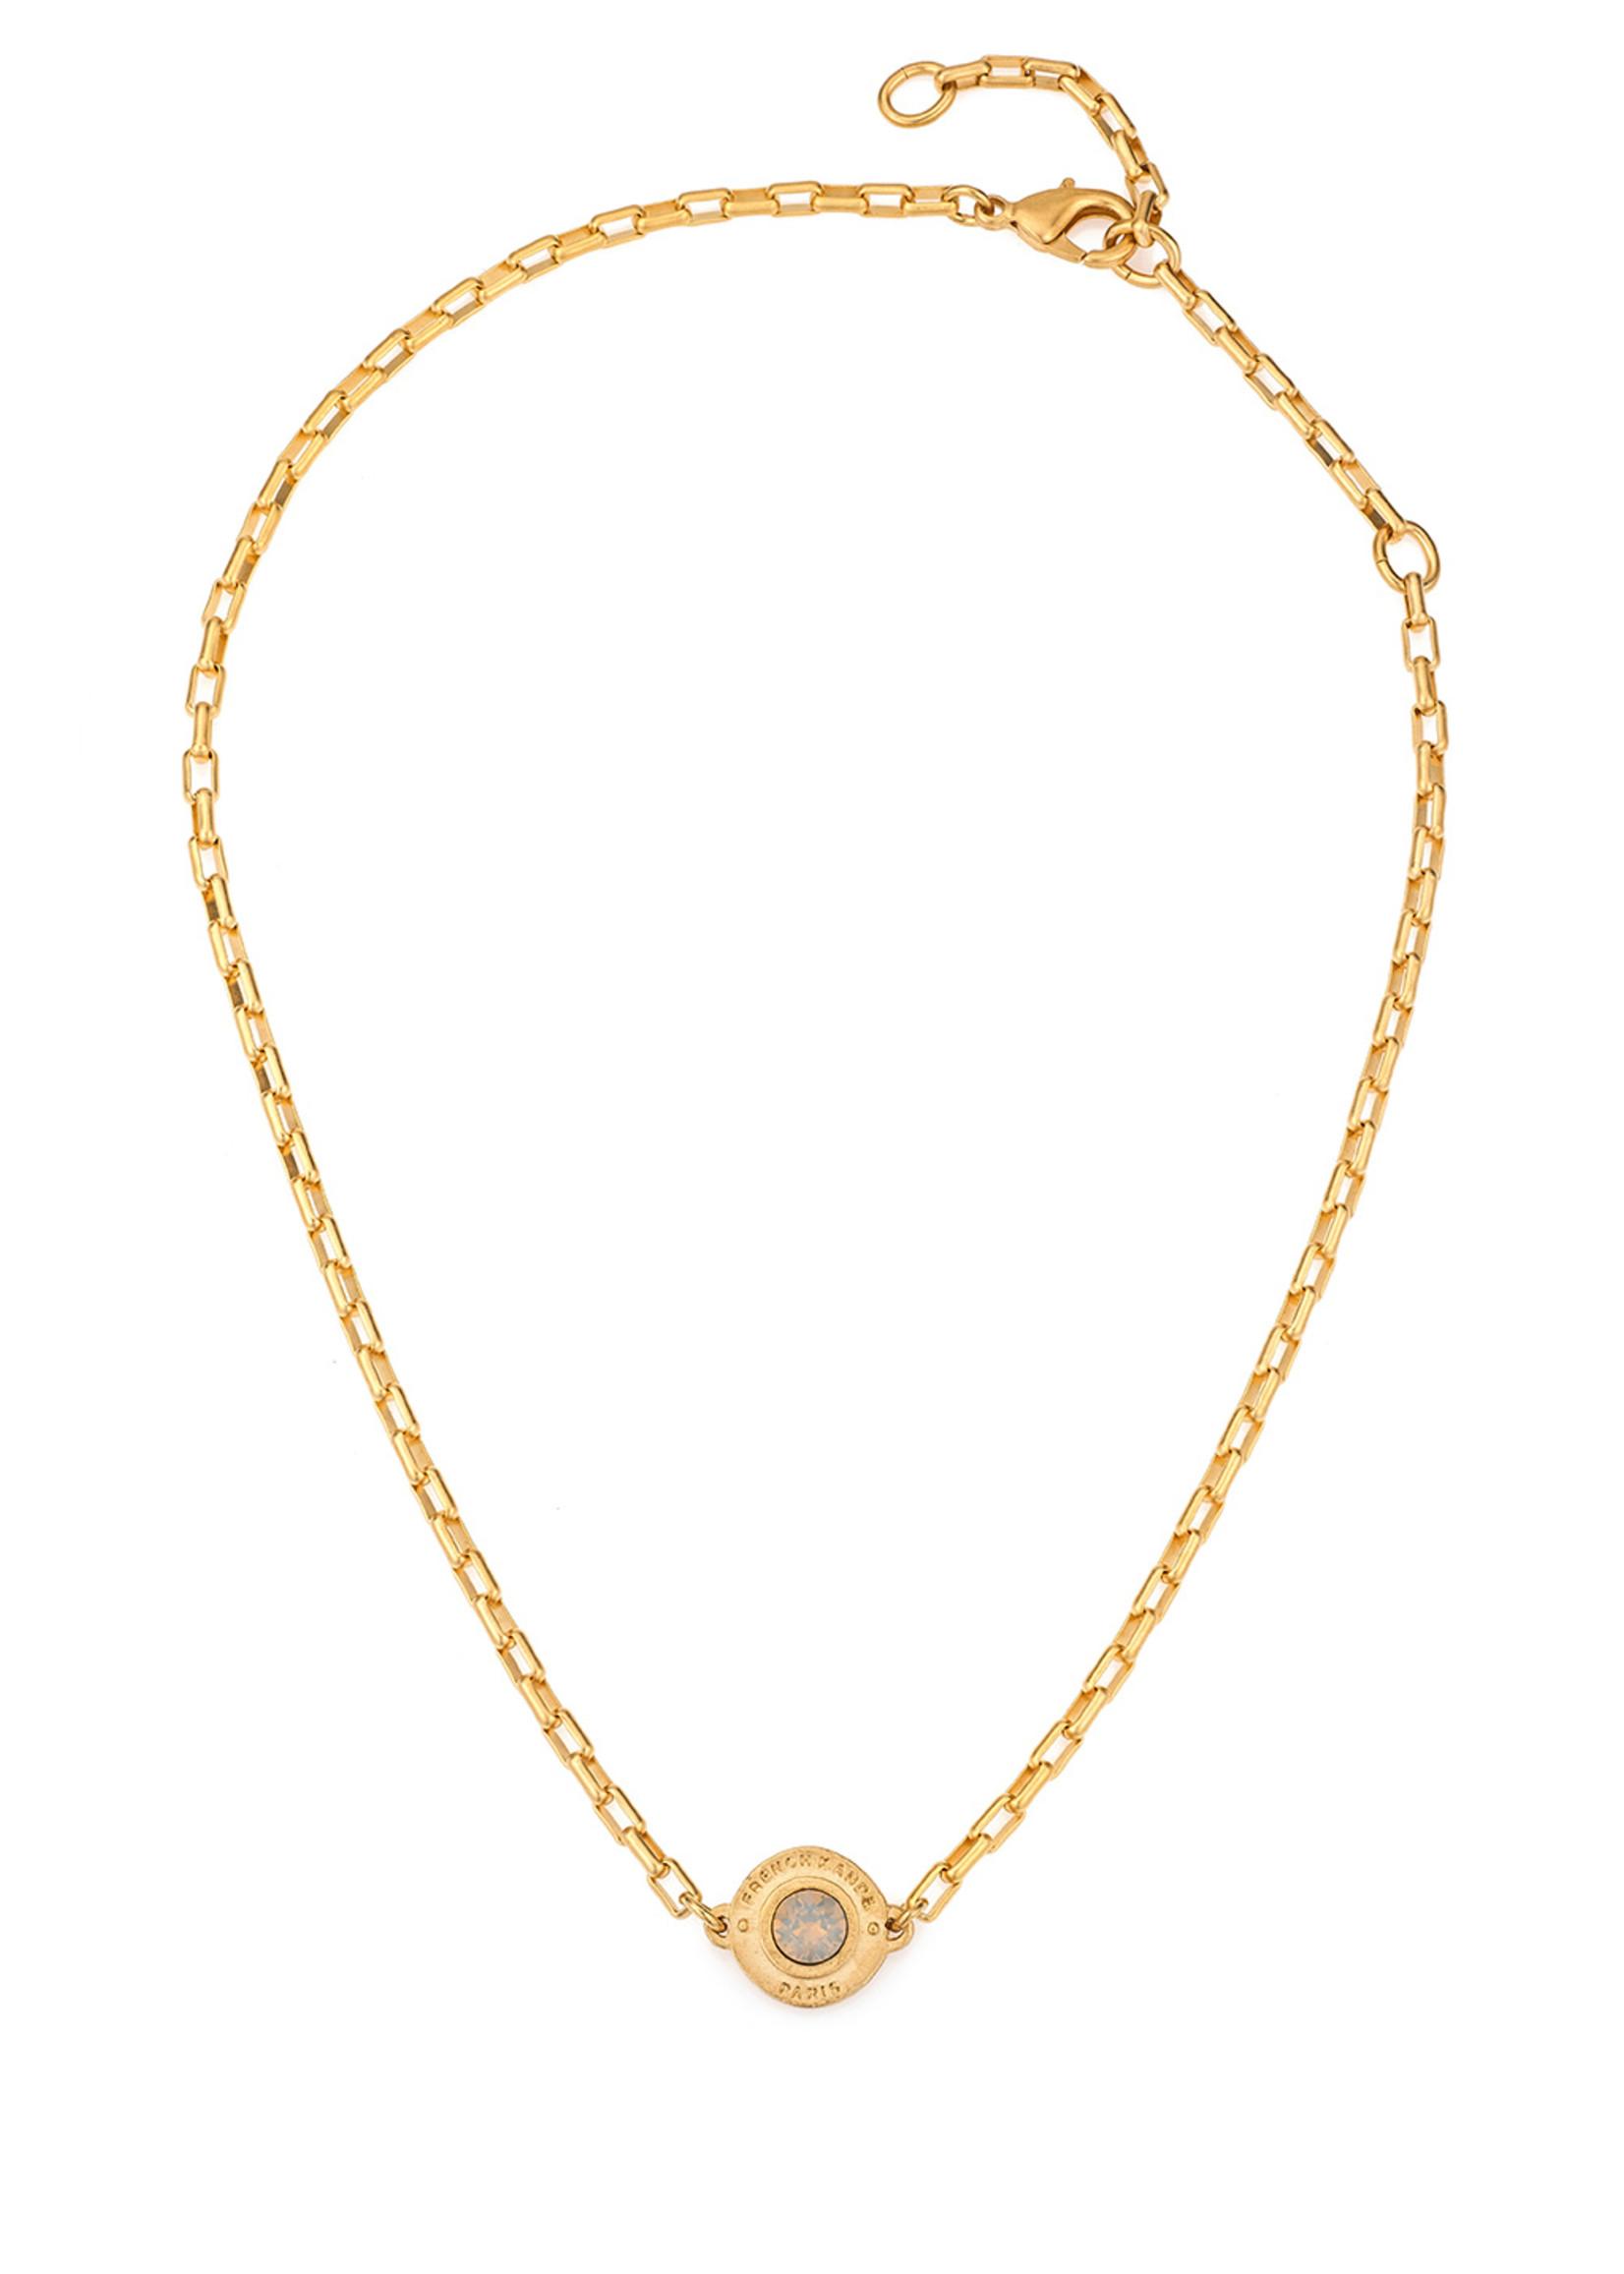 French Kande Loire Swarovski Annecy Necklace Gold